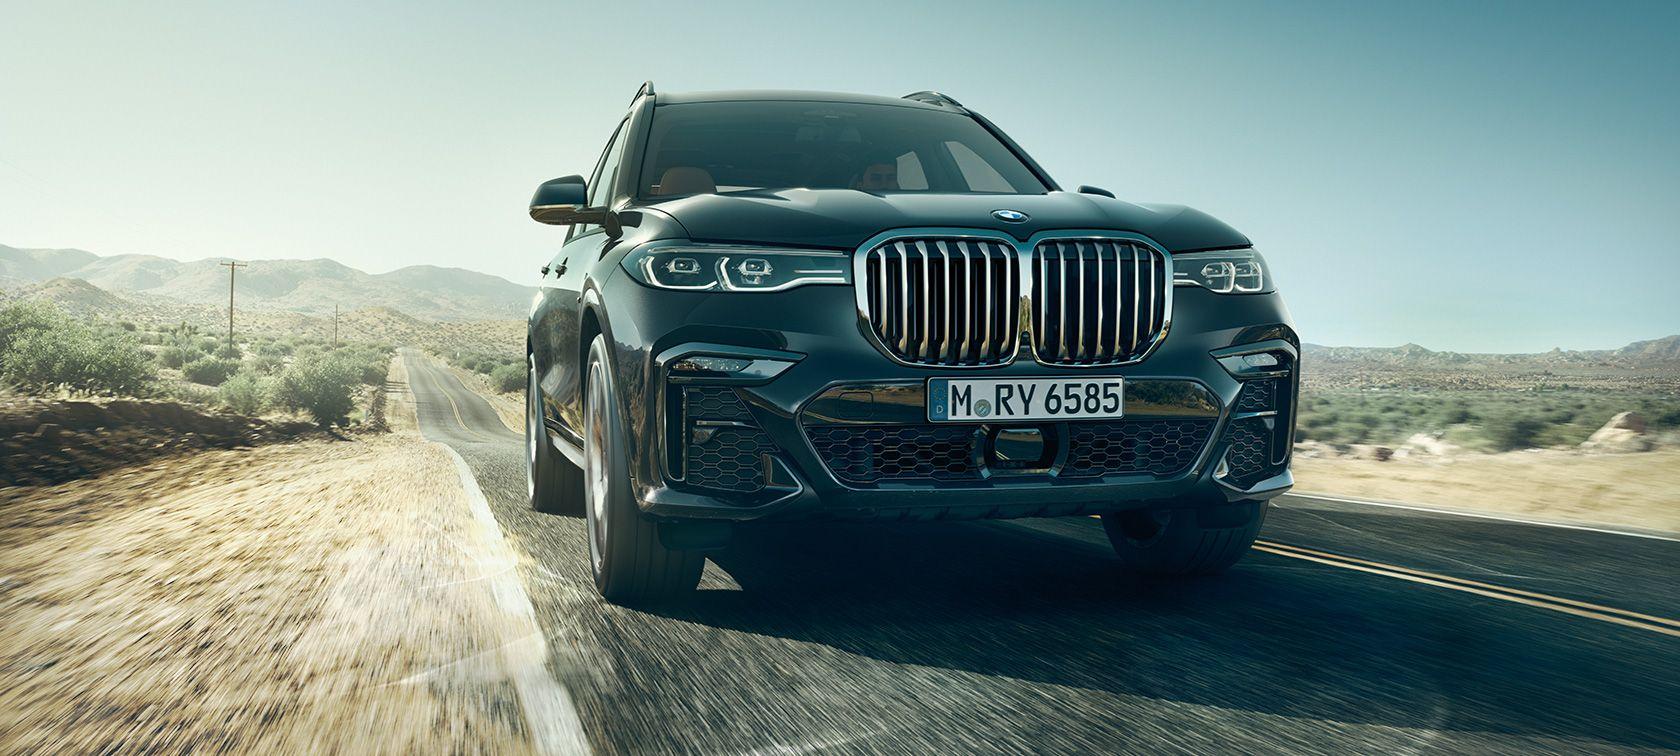 BMW X7 XDrive50i الجديدة 2020